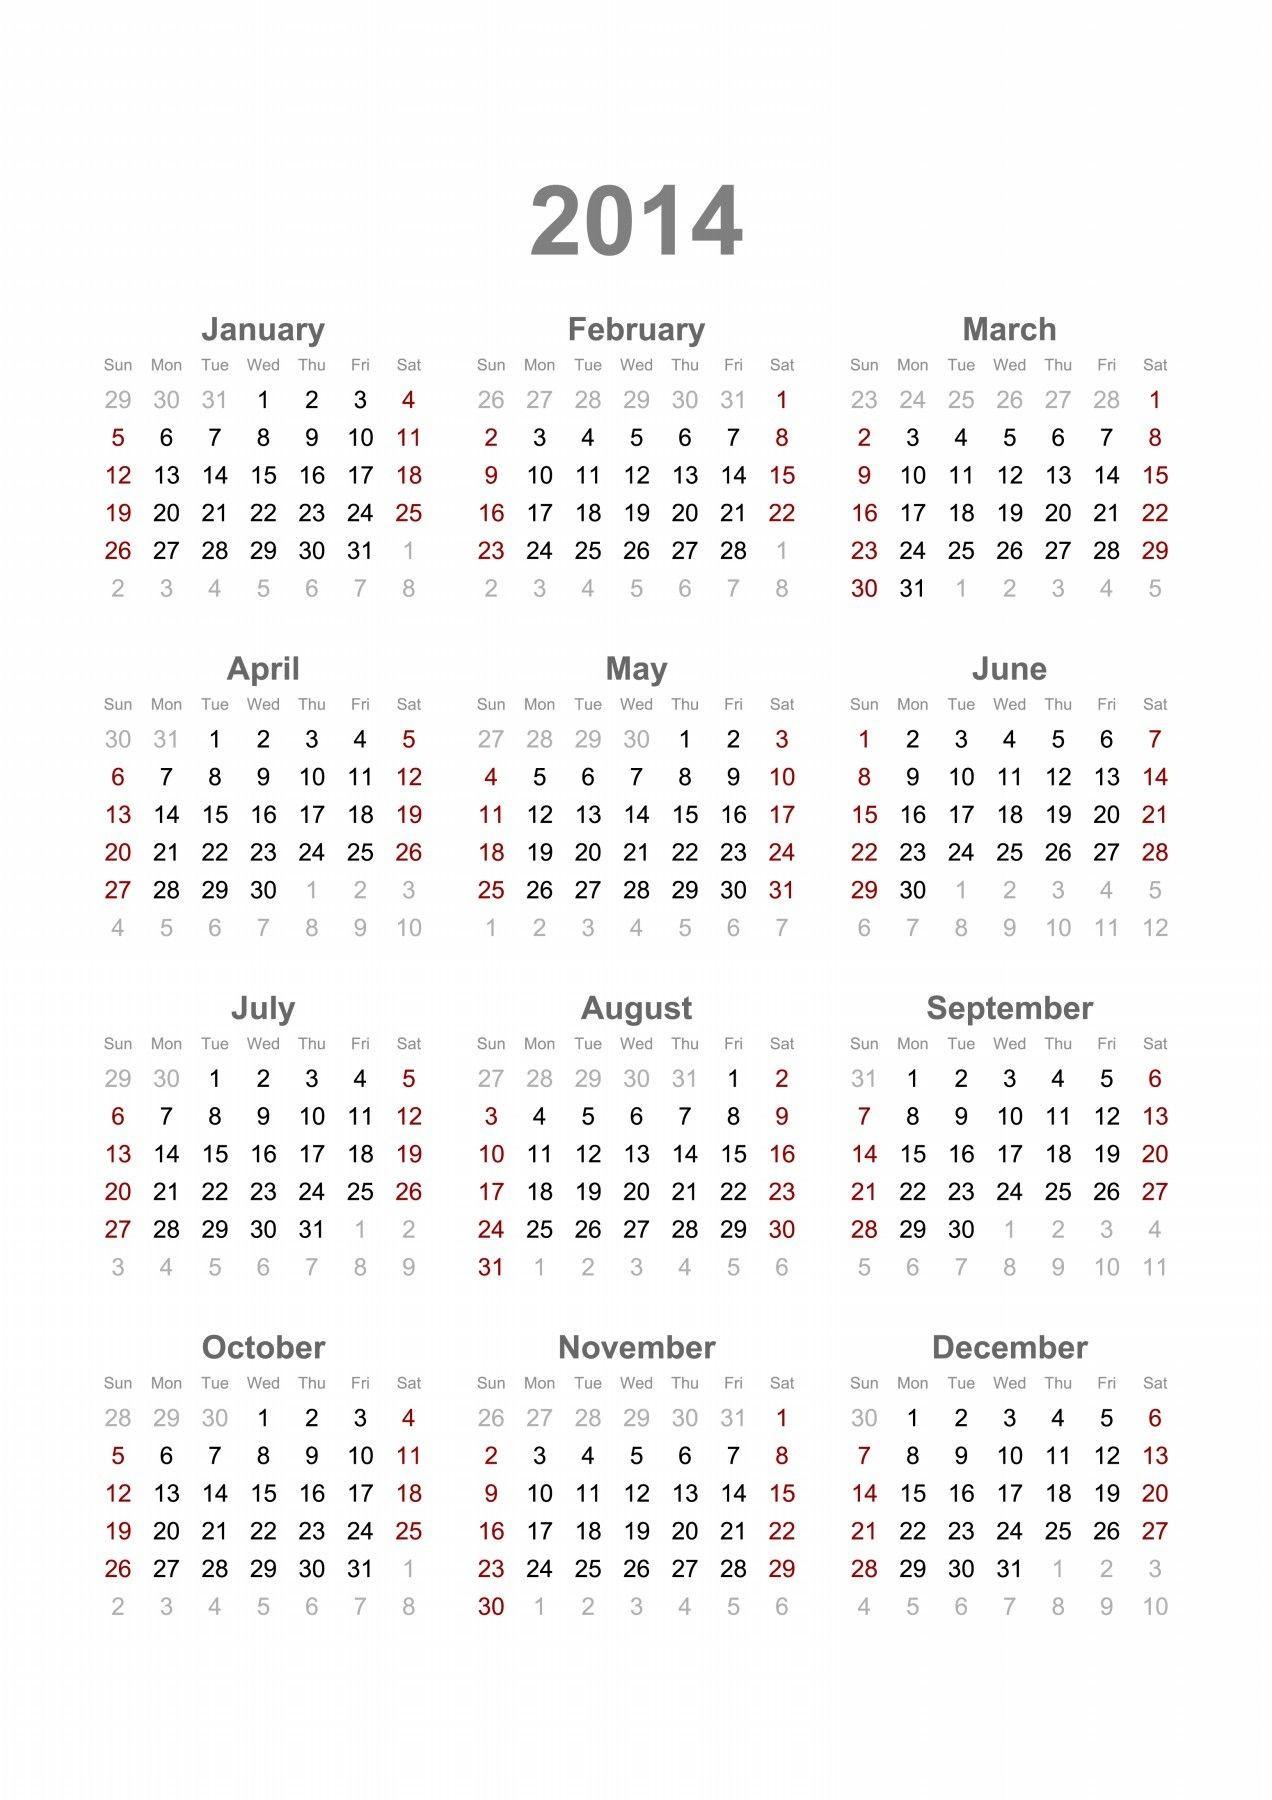 Blank December 2014 Calendar Template Duke 2017 2018 Calendar Printable for Absolutely Free – SonidoSereno